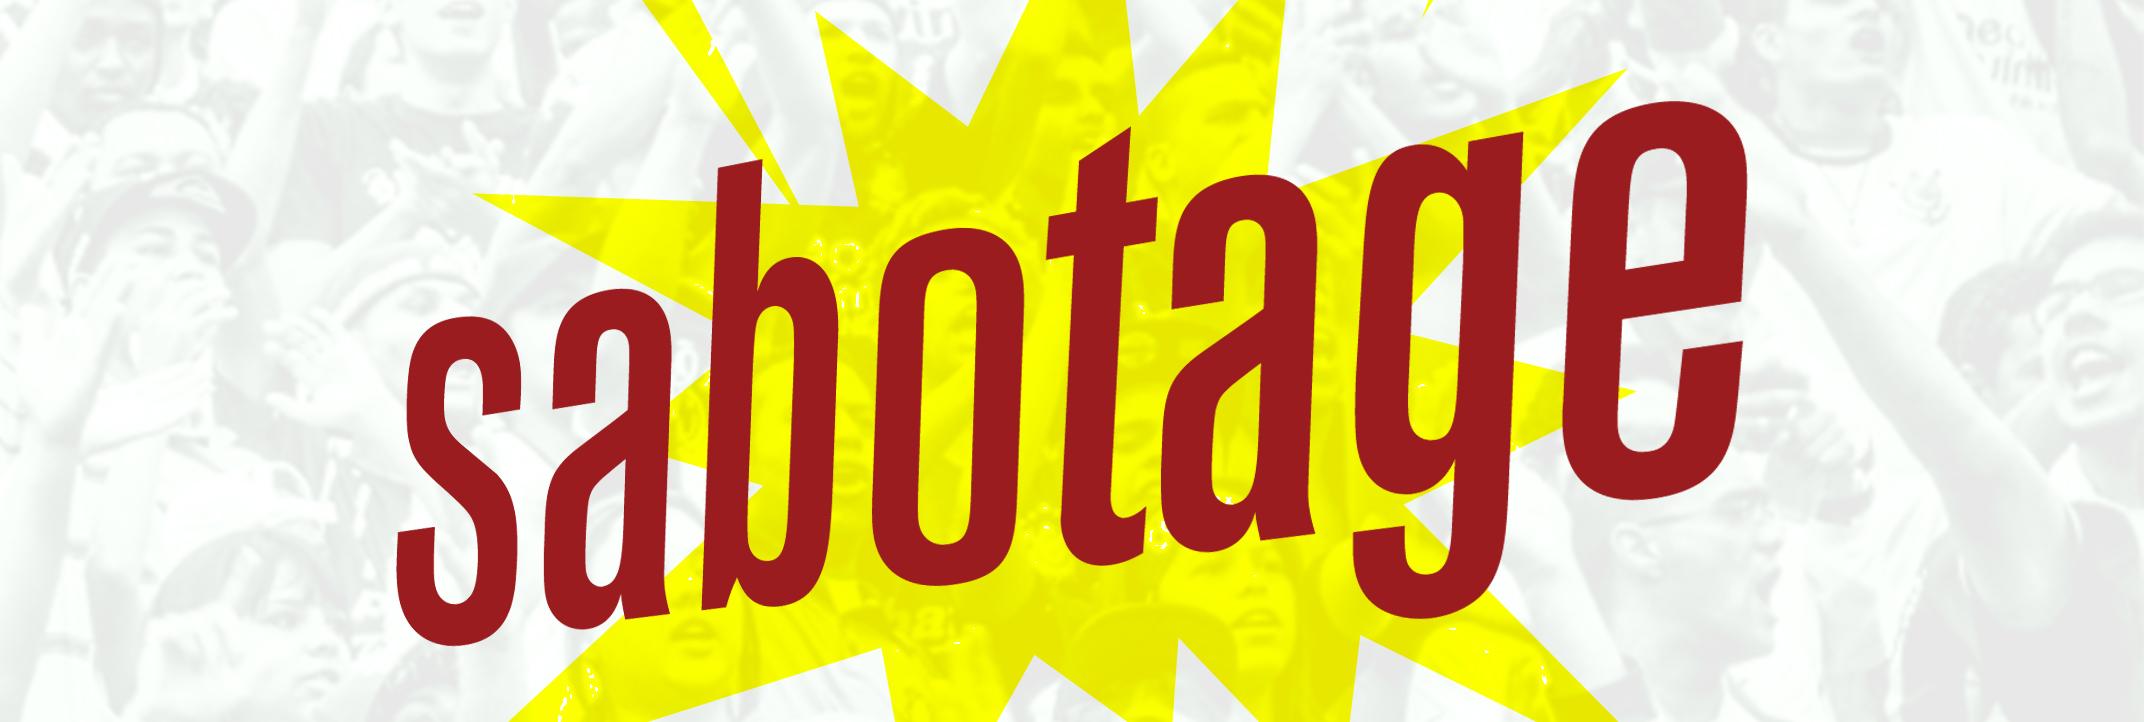 Sabotage_messagemedia.jpg